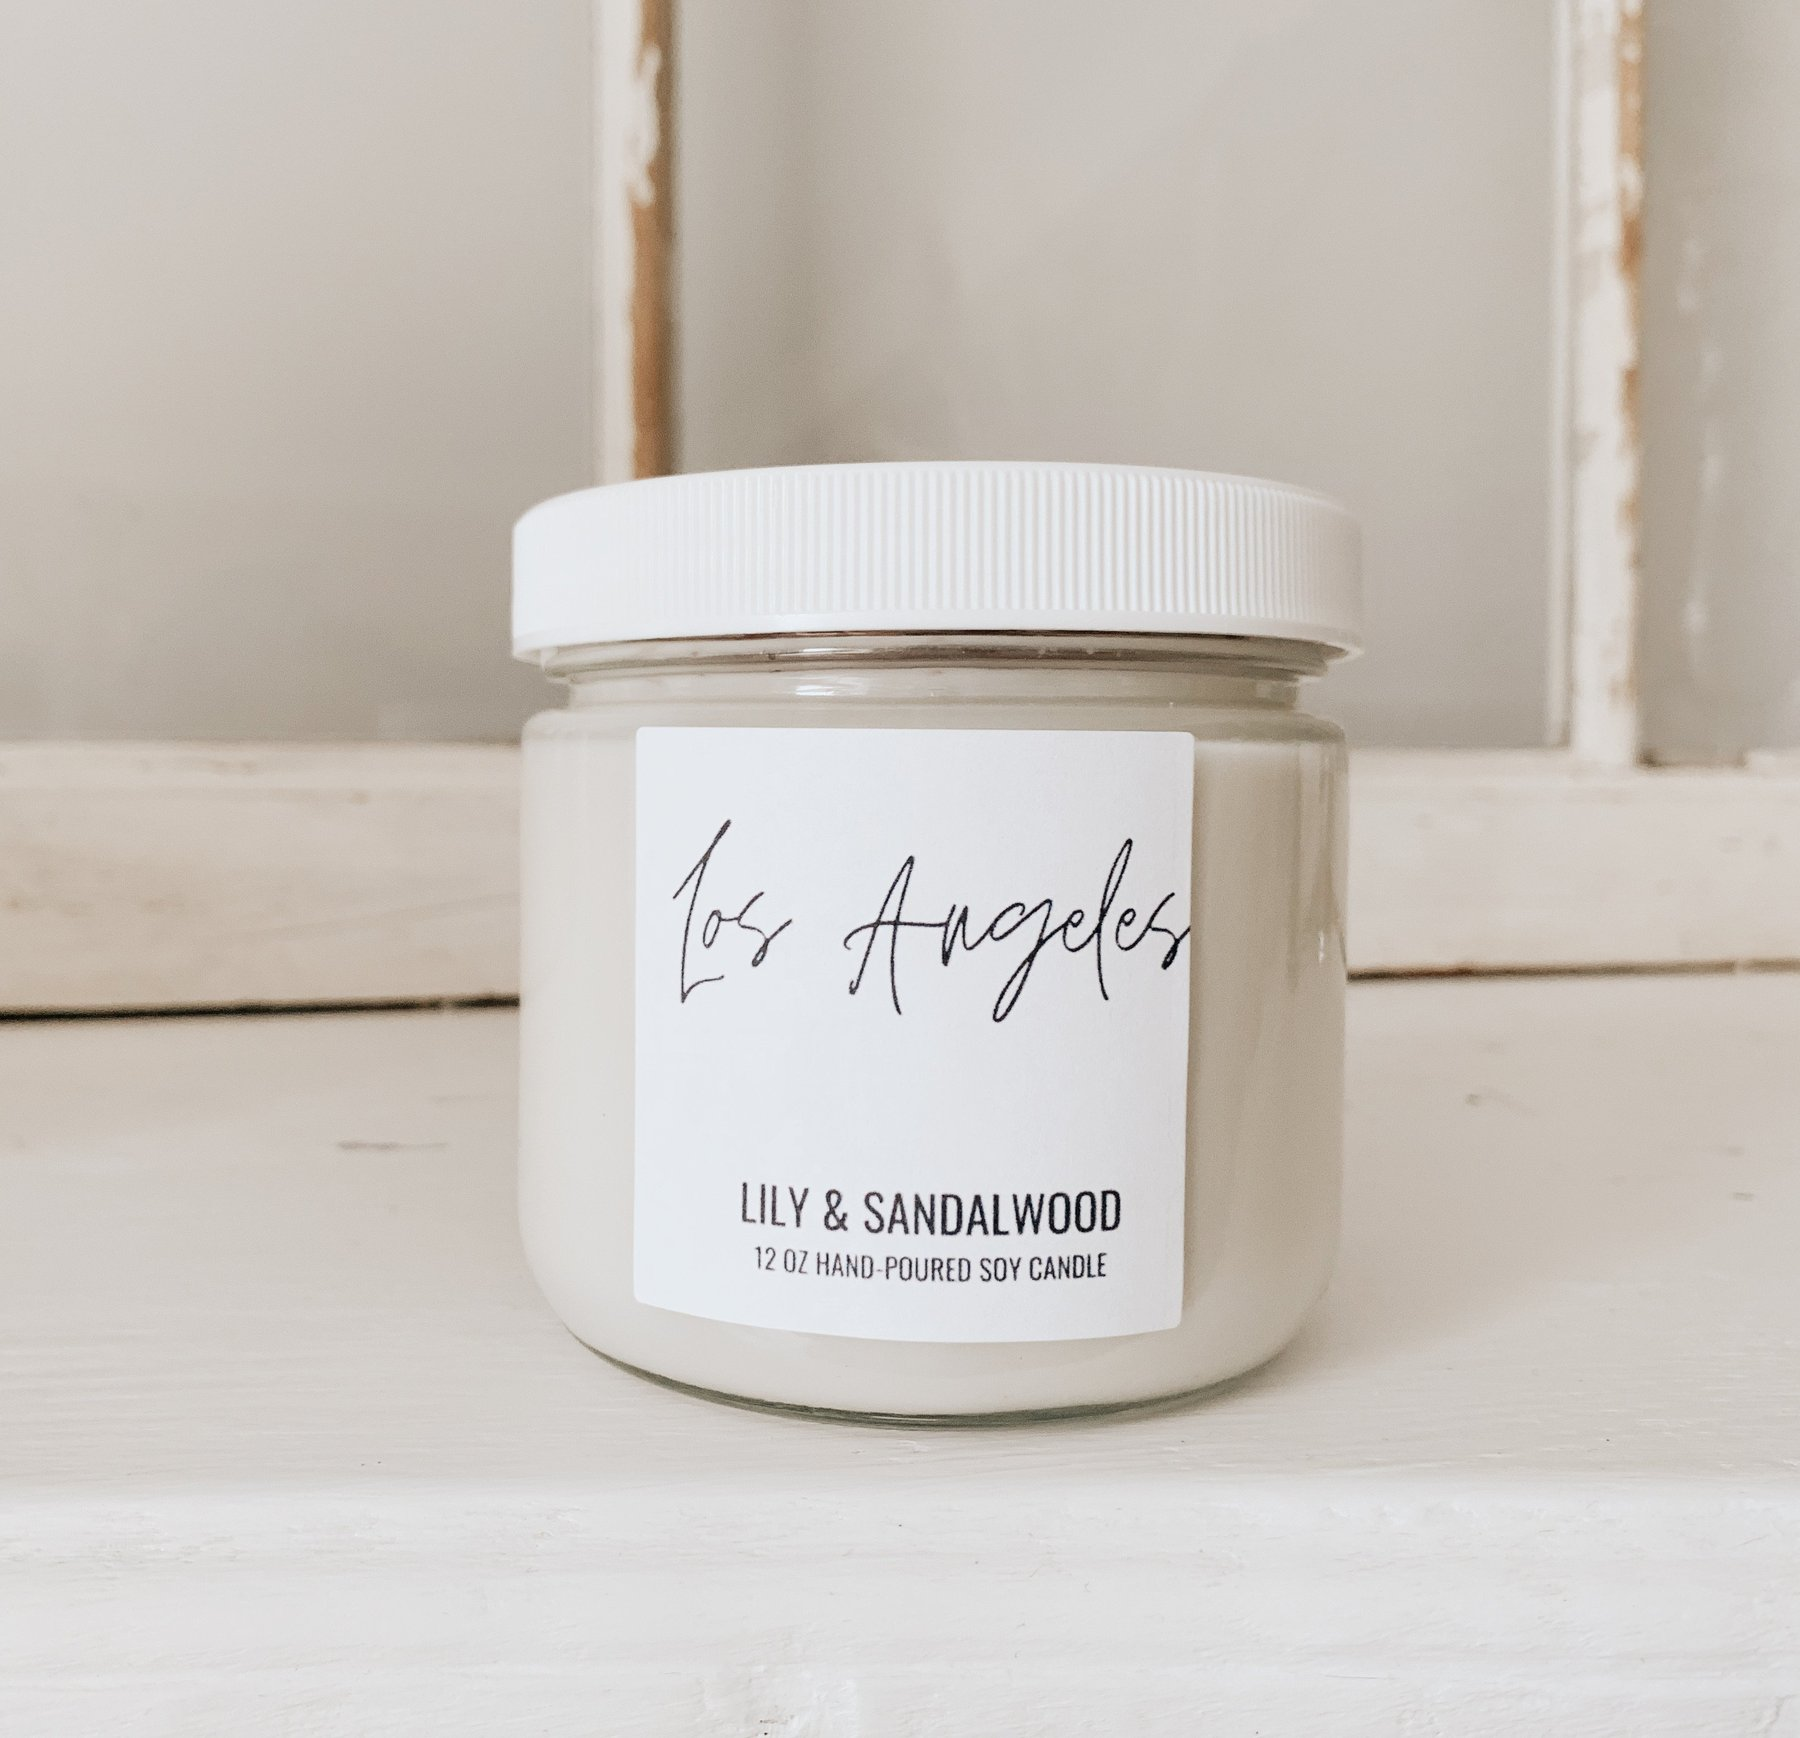 Los Angeles Lily & Sandalwood